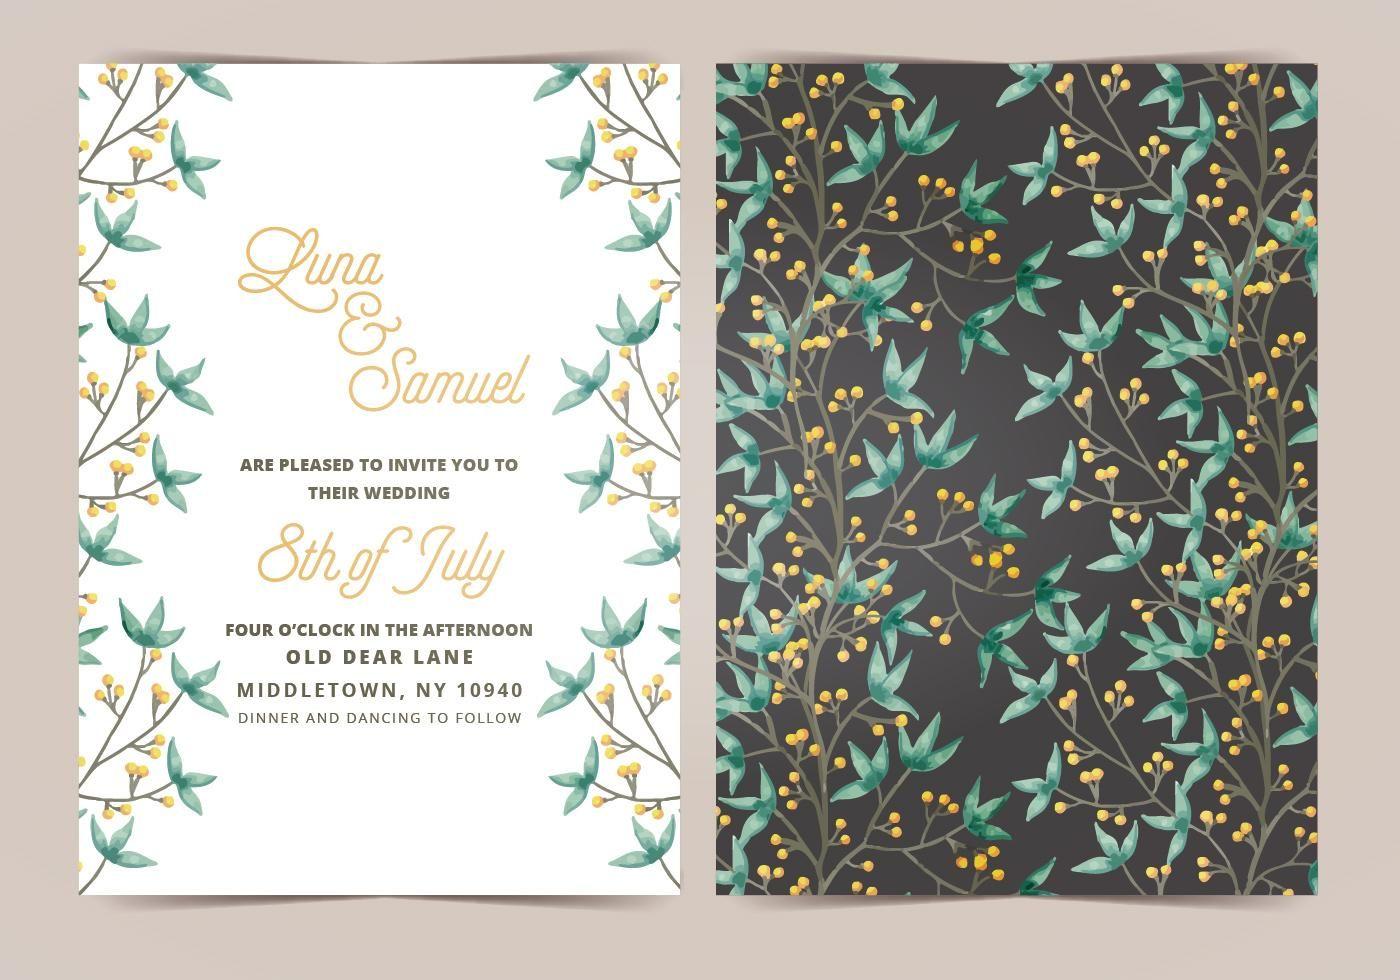 Boho Wedding Vector Wedding Invitation | Wedding Inspiration ...